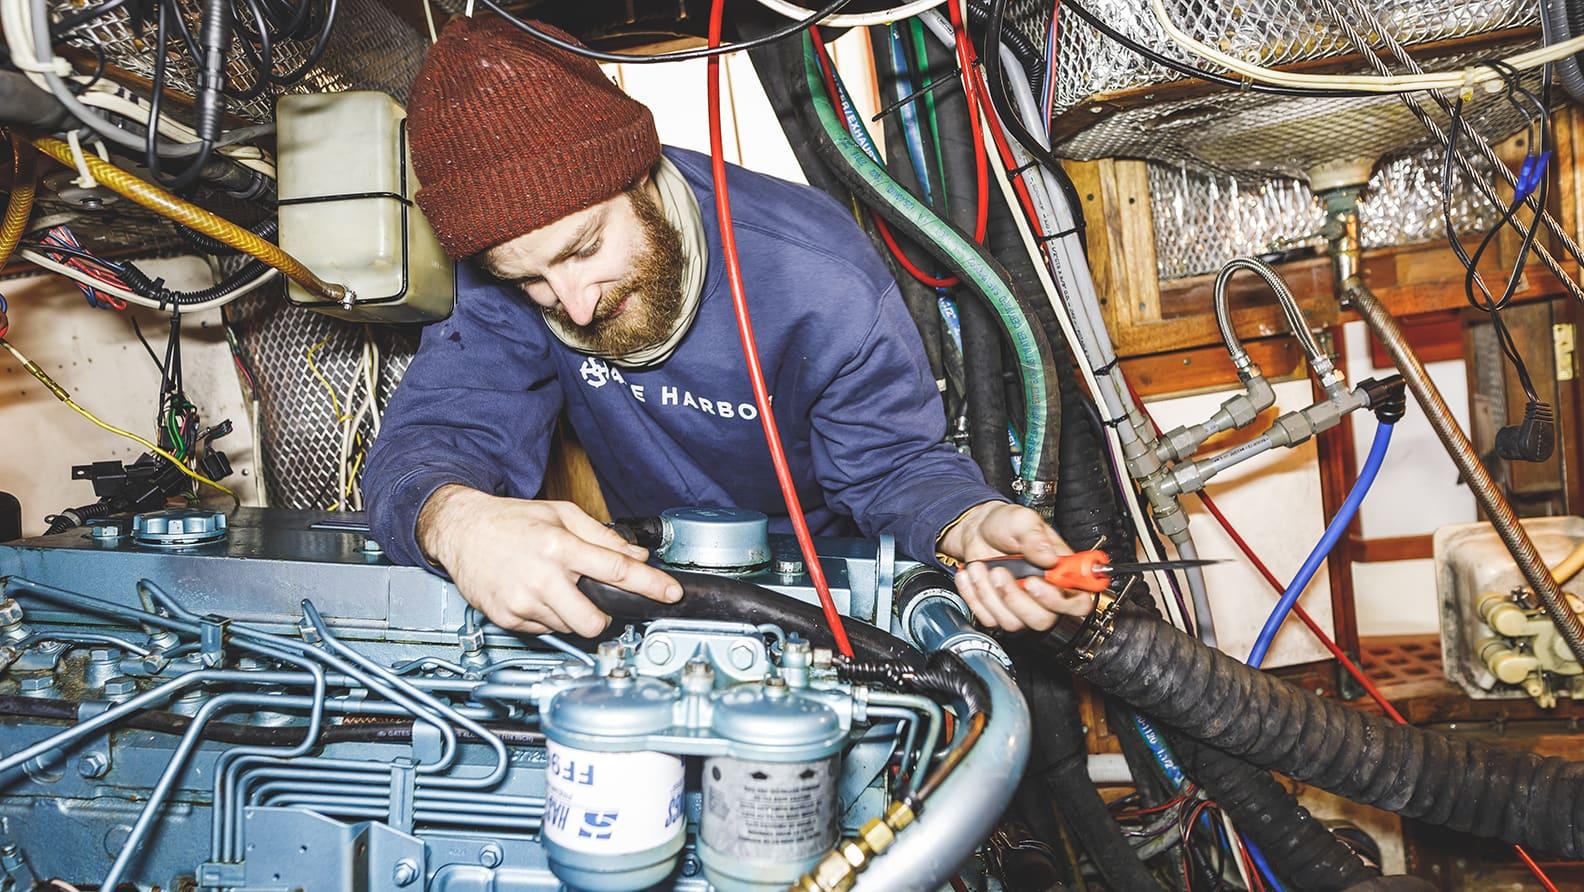 man fixing boat